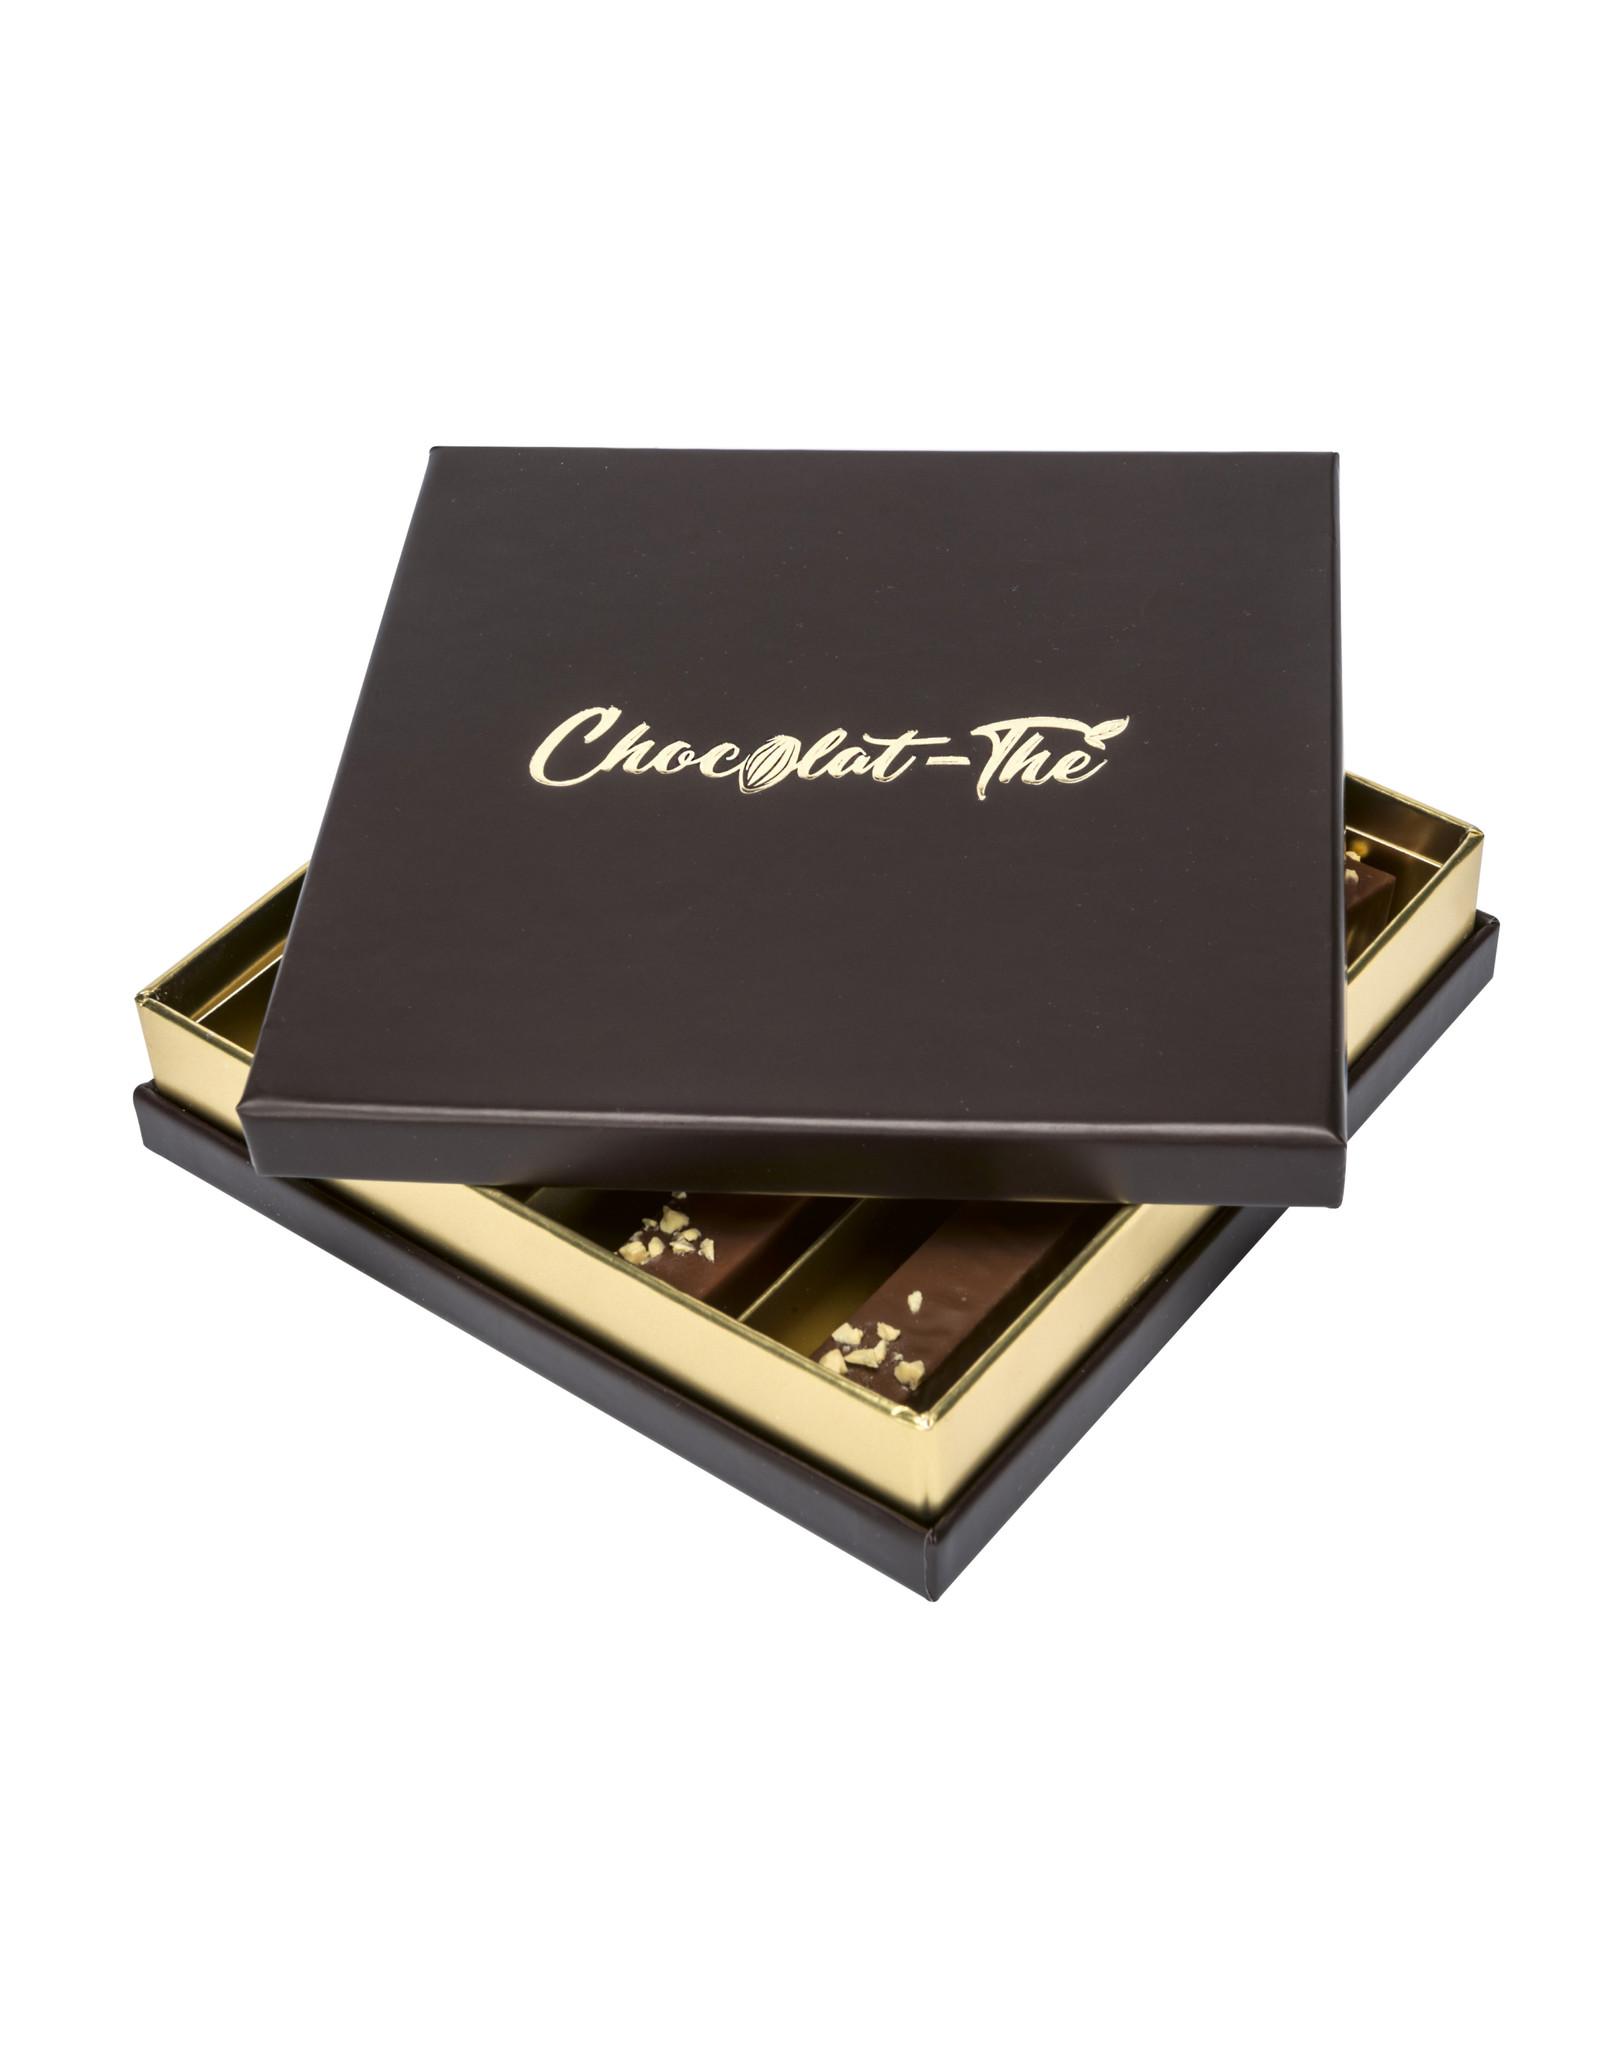 Luxury box 9.5x9.5x3cm